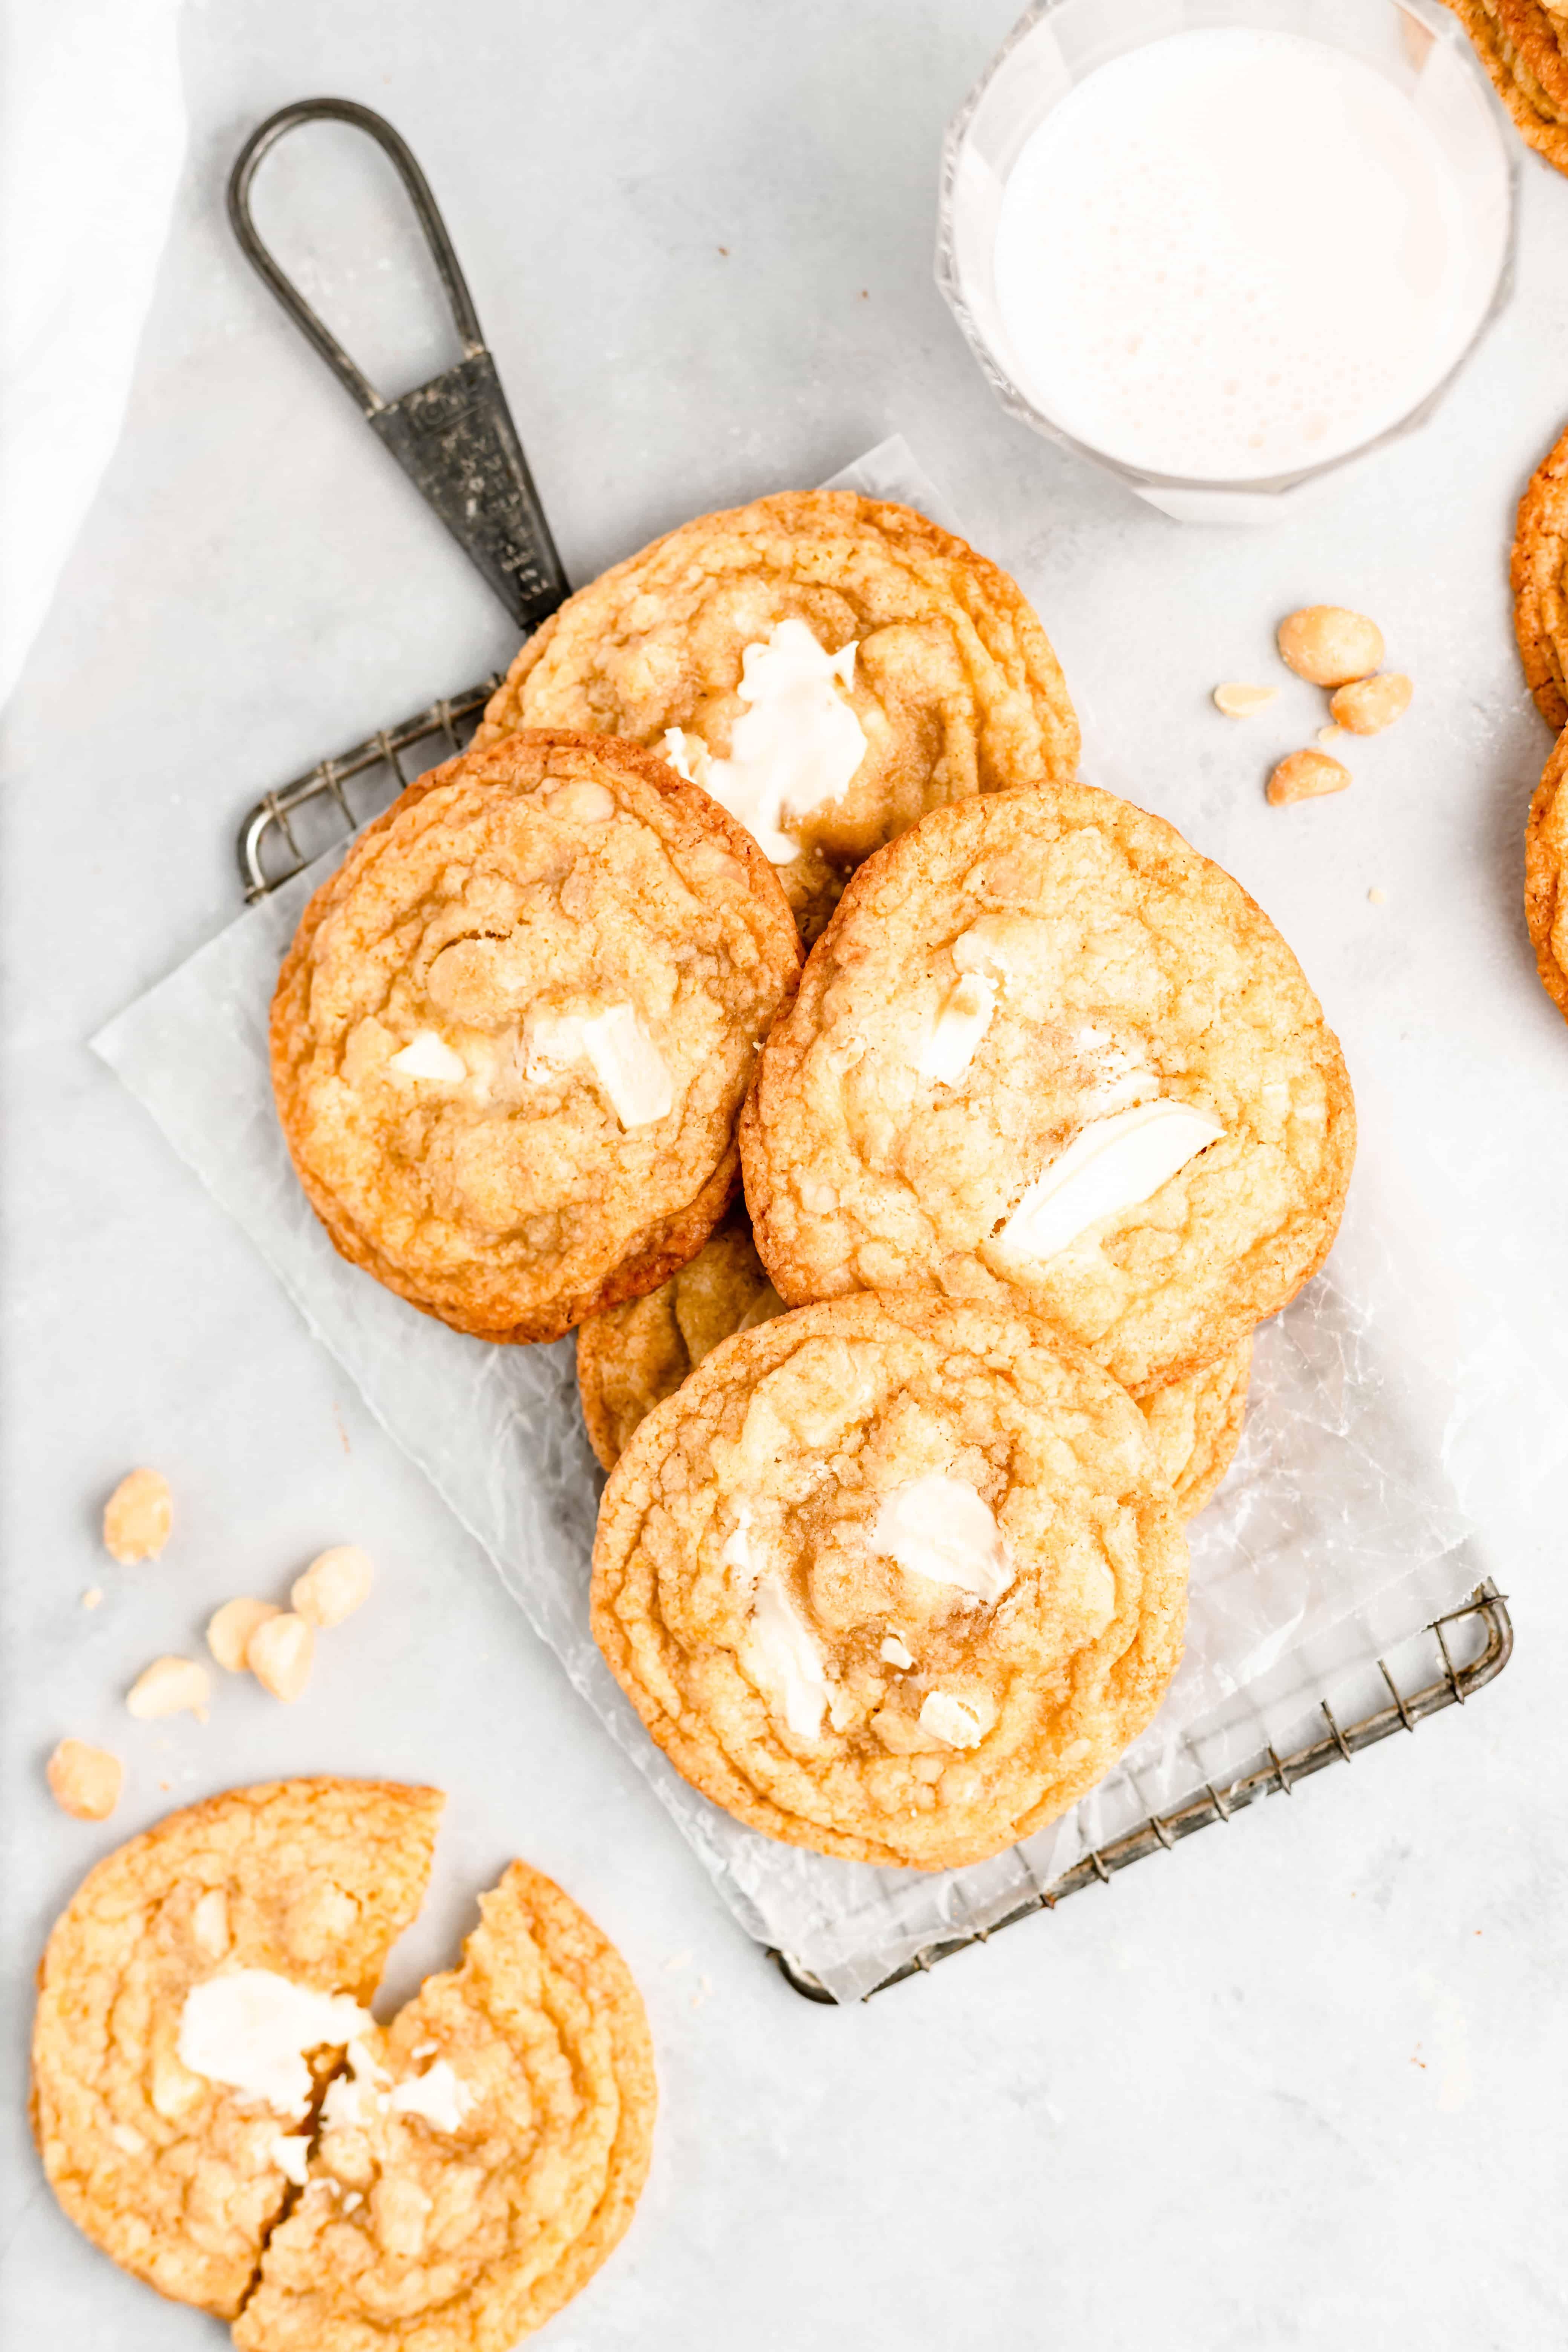 Pan-Banging White Chocolate Macadamia Nut Cookies